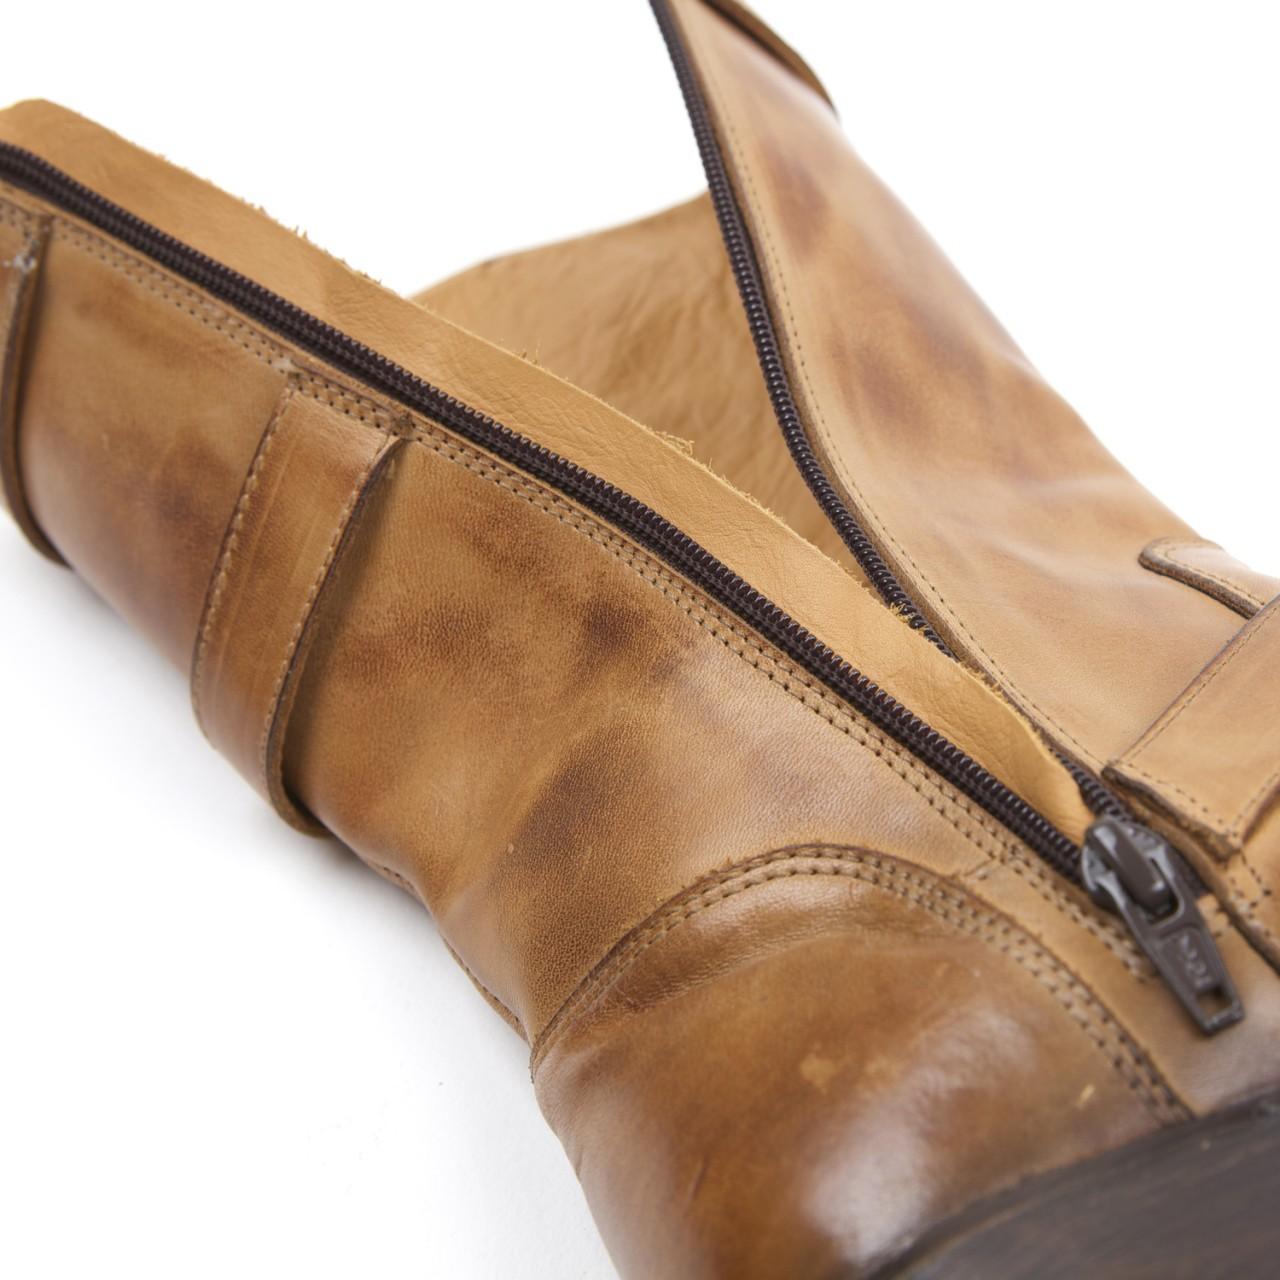 Bottes et Chaussures Moto - Vintage-Motorsnet - Vintage